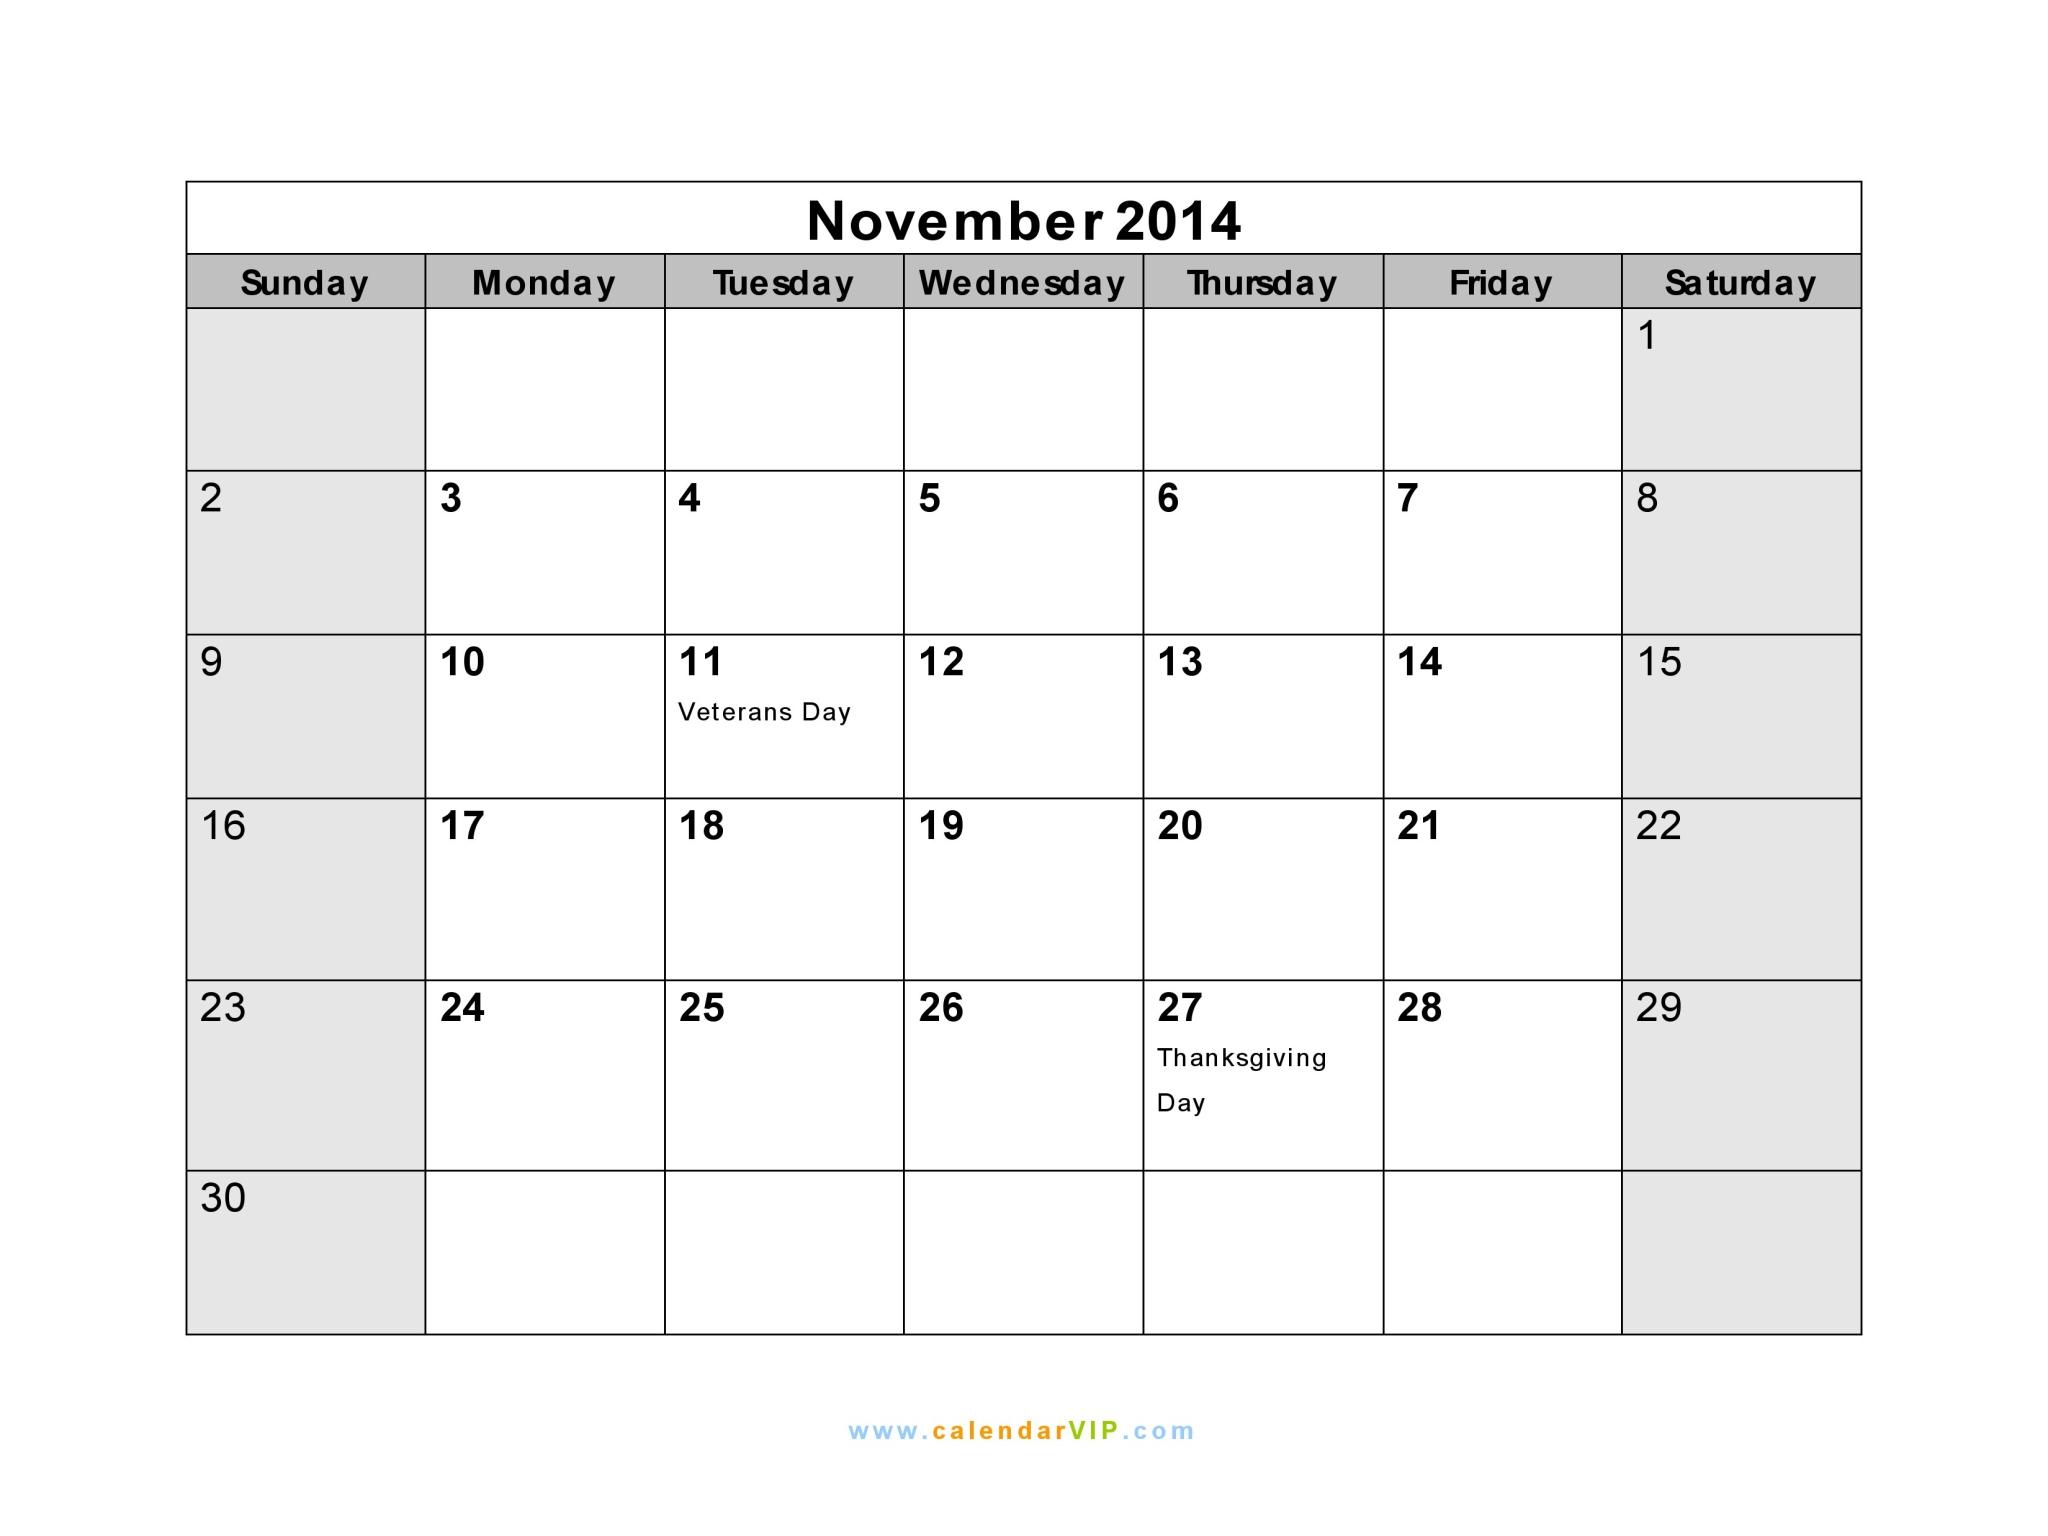 November 2014 Calendar - Blank Printable Calendar Template In Pdf within Microsoft November Calendar Templates